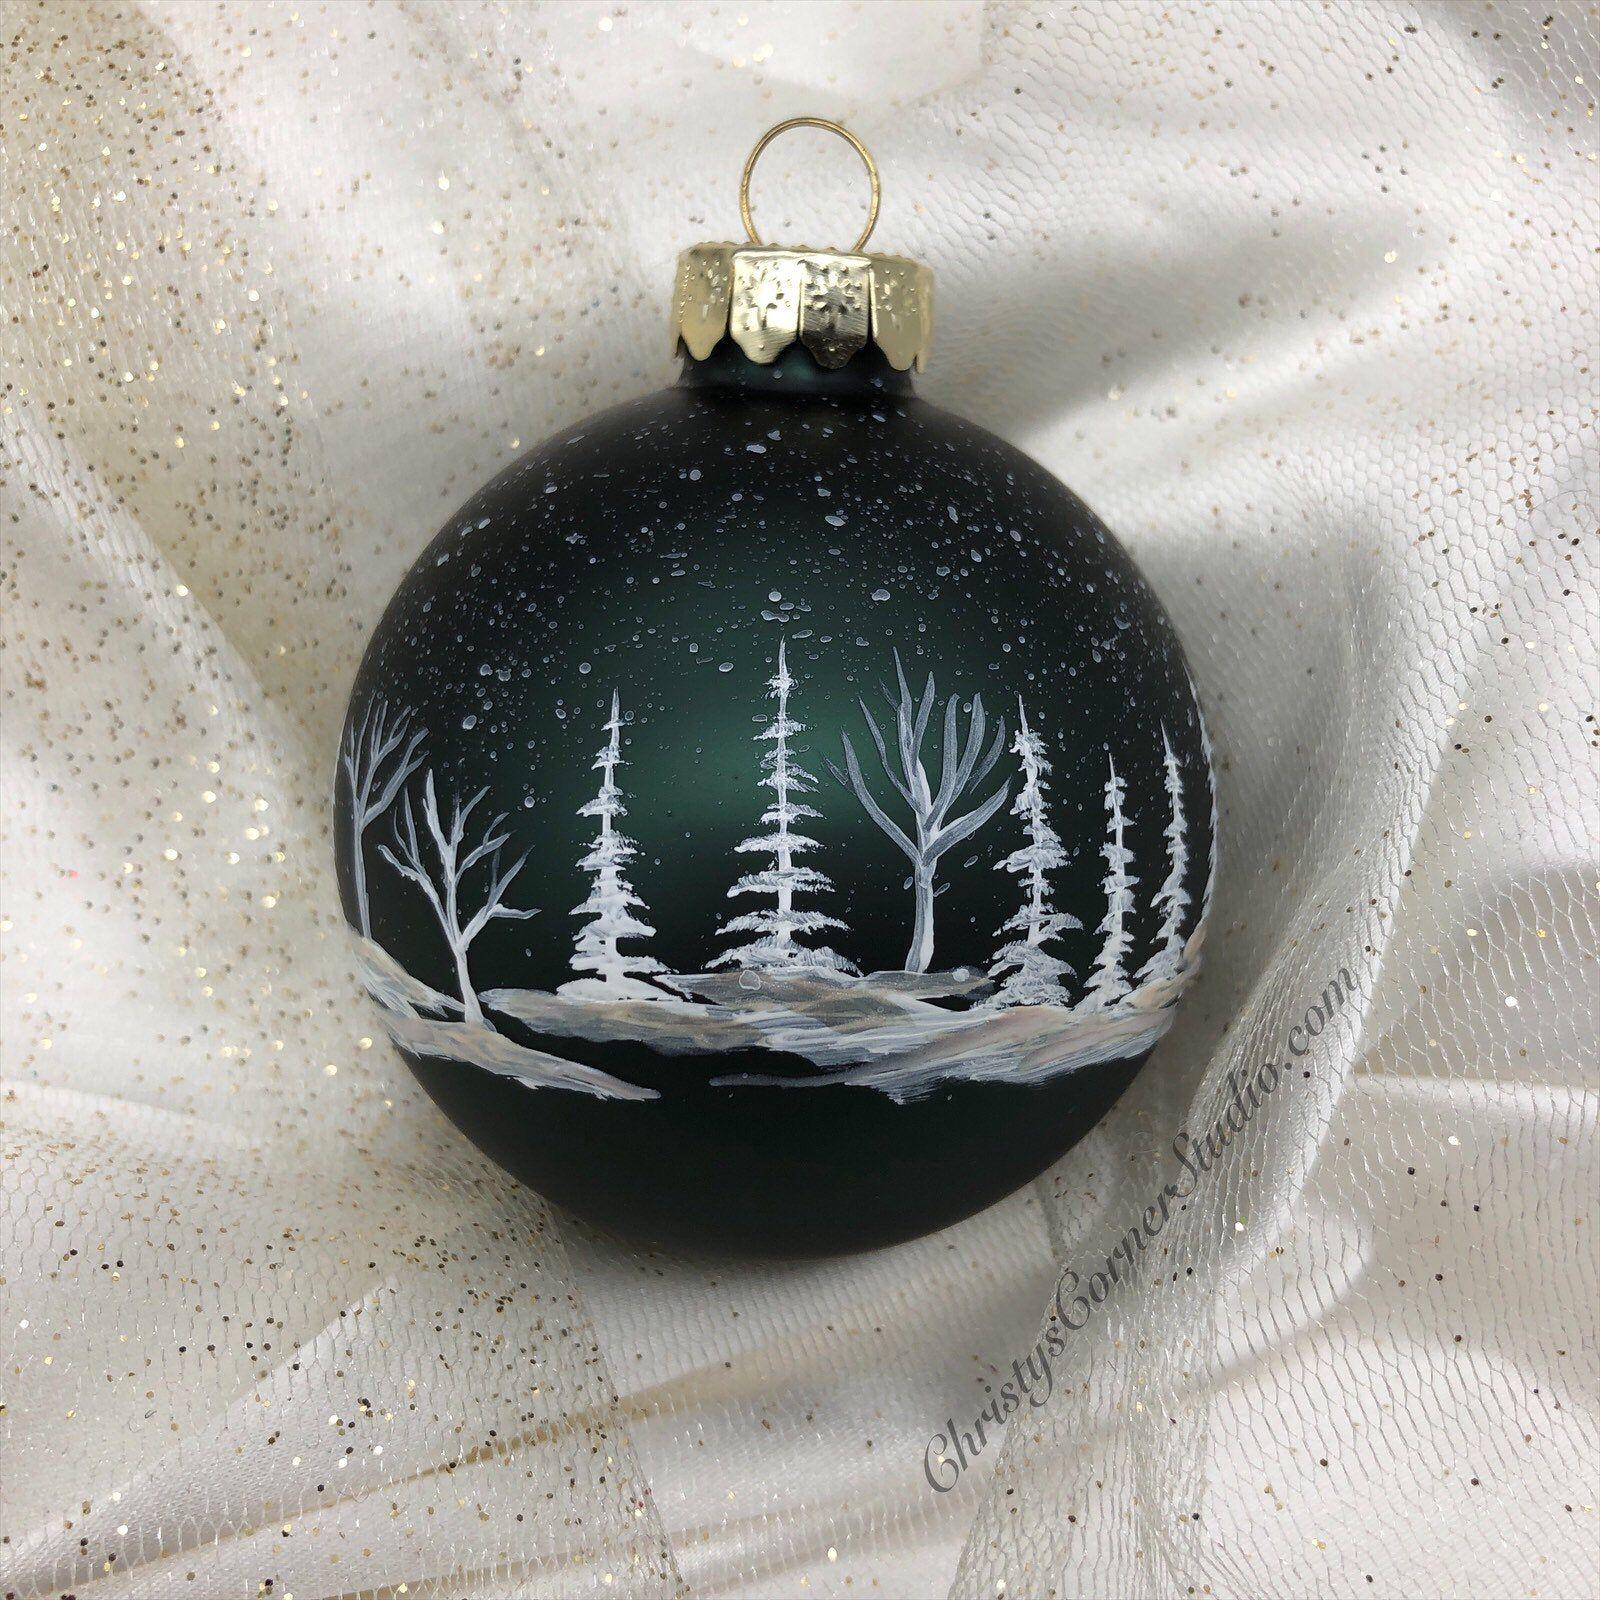 Handpainted Glass Christmas Ornament Black Dark Green Glass Etsy Christmas Ornaments Handpainted Christmas Ornaments Glass Christmas Ornaments